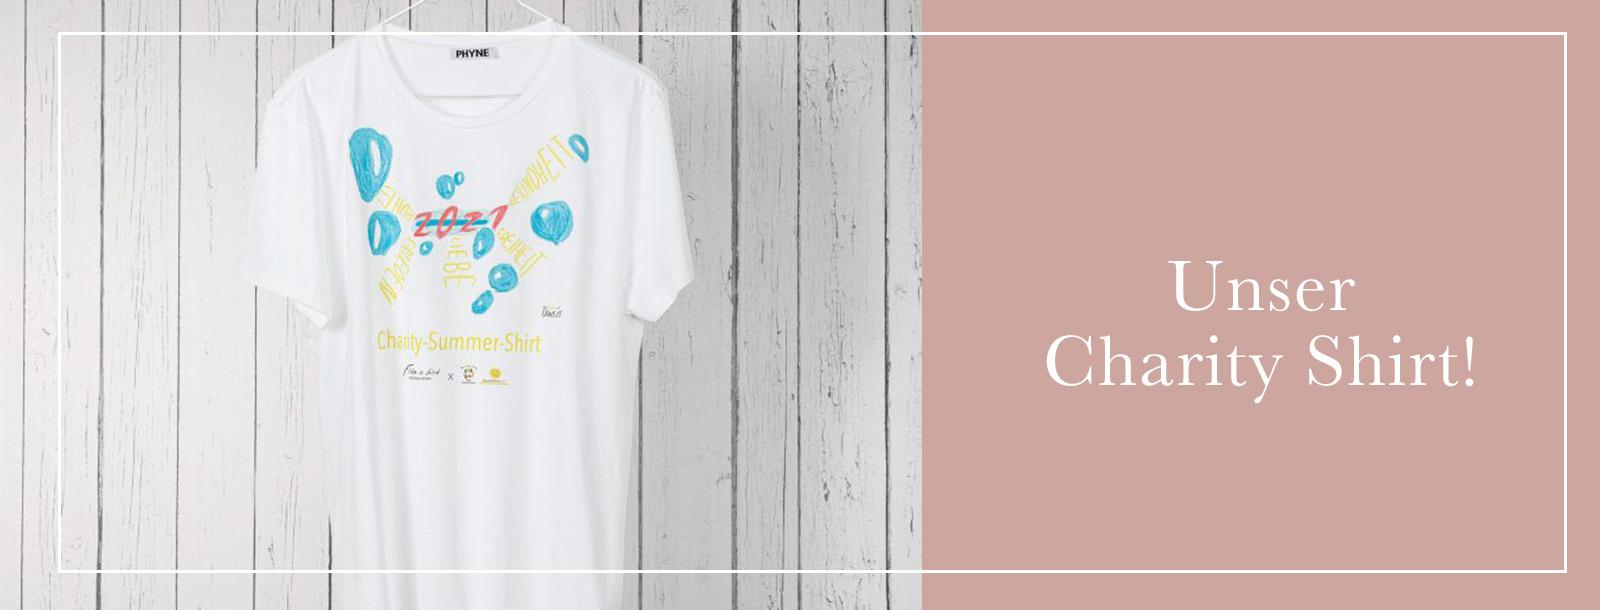 Informationen zum Charity Shirt!